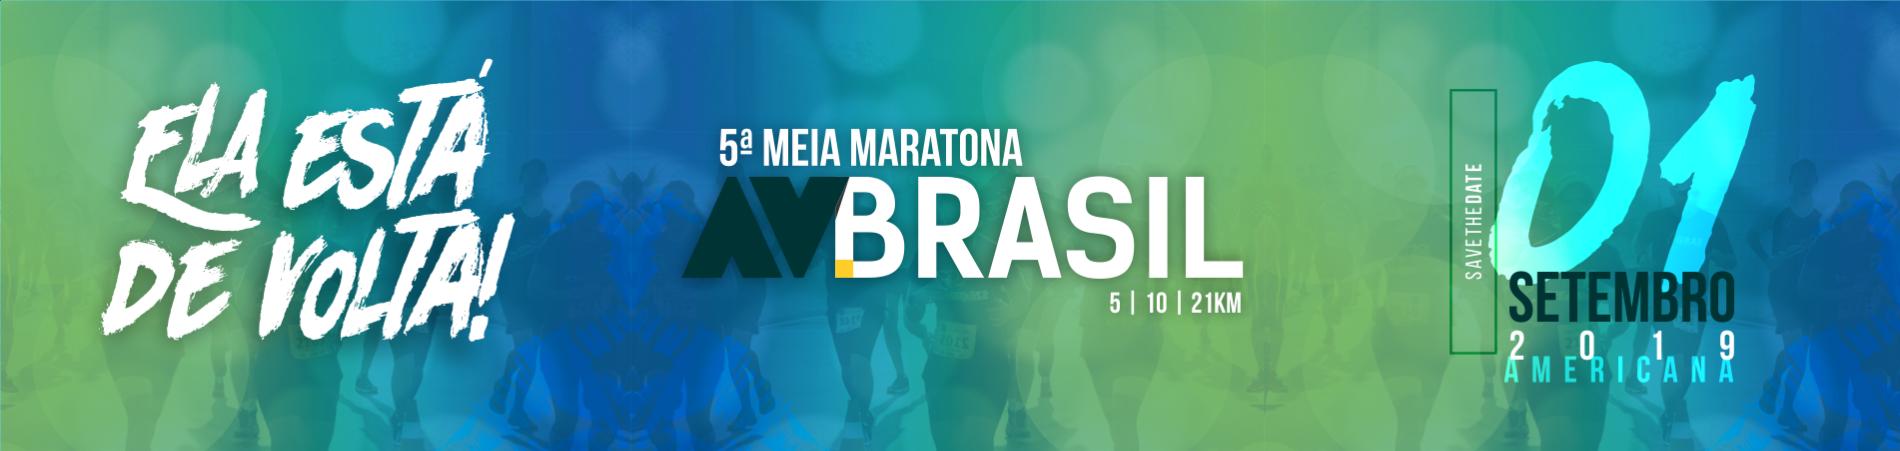 MEIA MARATONA AVENIDA BRASIL 2019